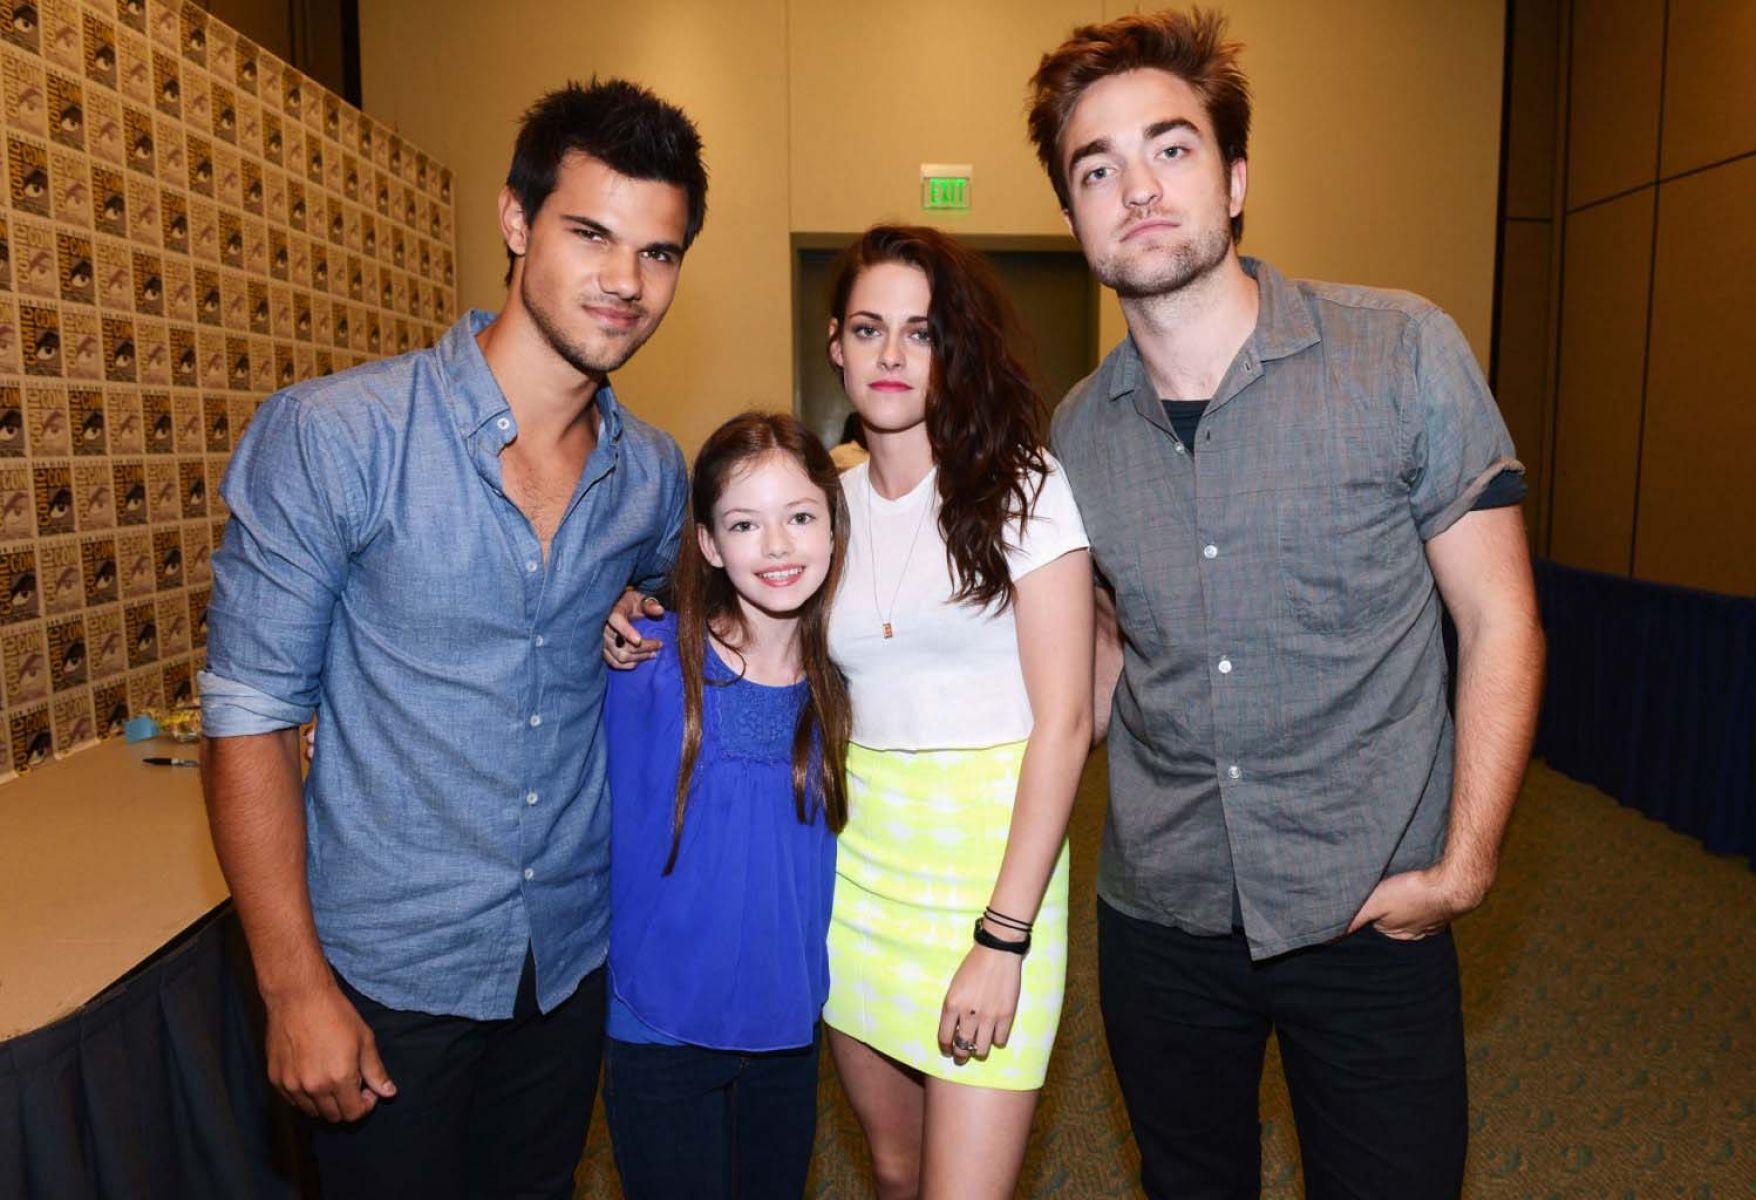 The Twilight Saga Breaking Dawn Part 2 Wallpaper - Twilight Breaking Dawn Part 2 Cast - HD Wallpaper